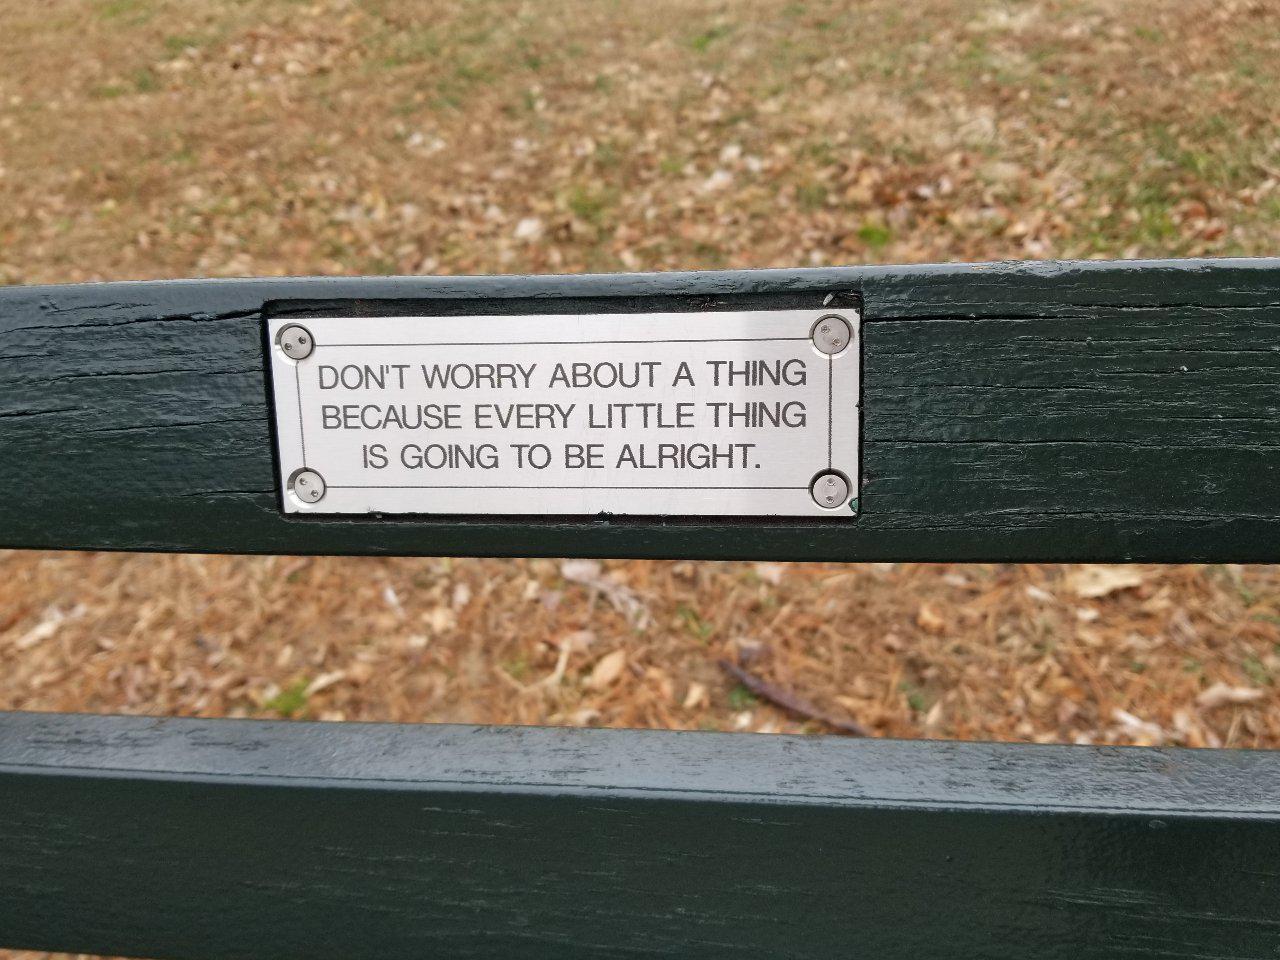 [Image] Central Park bench plaque